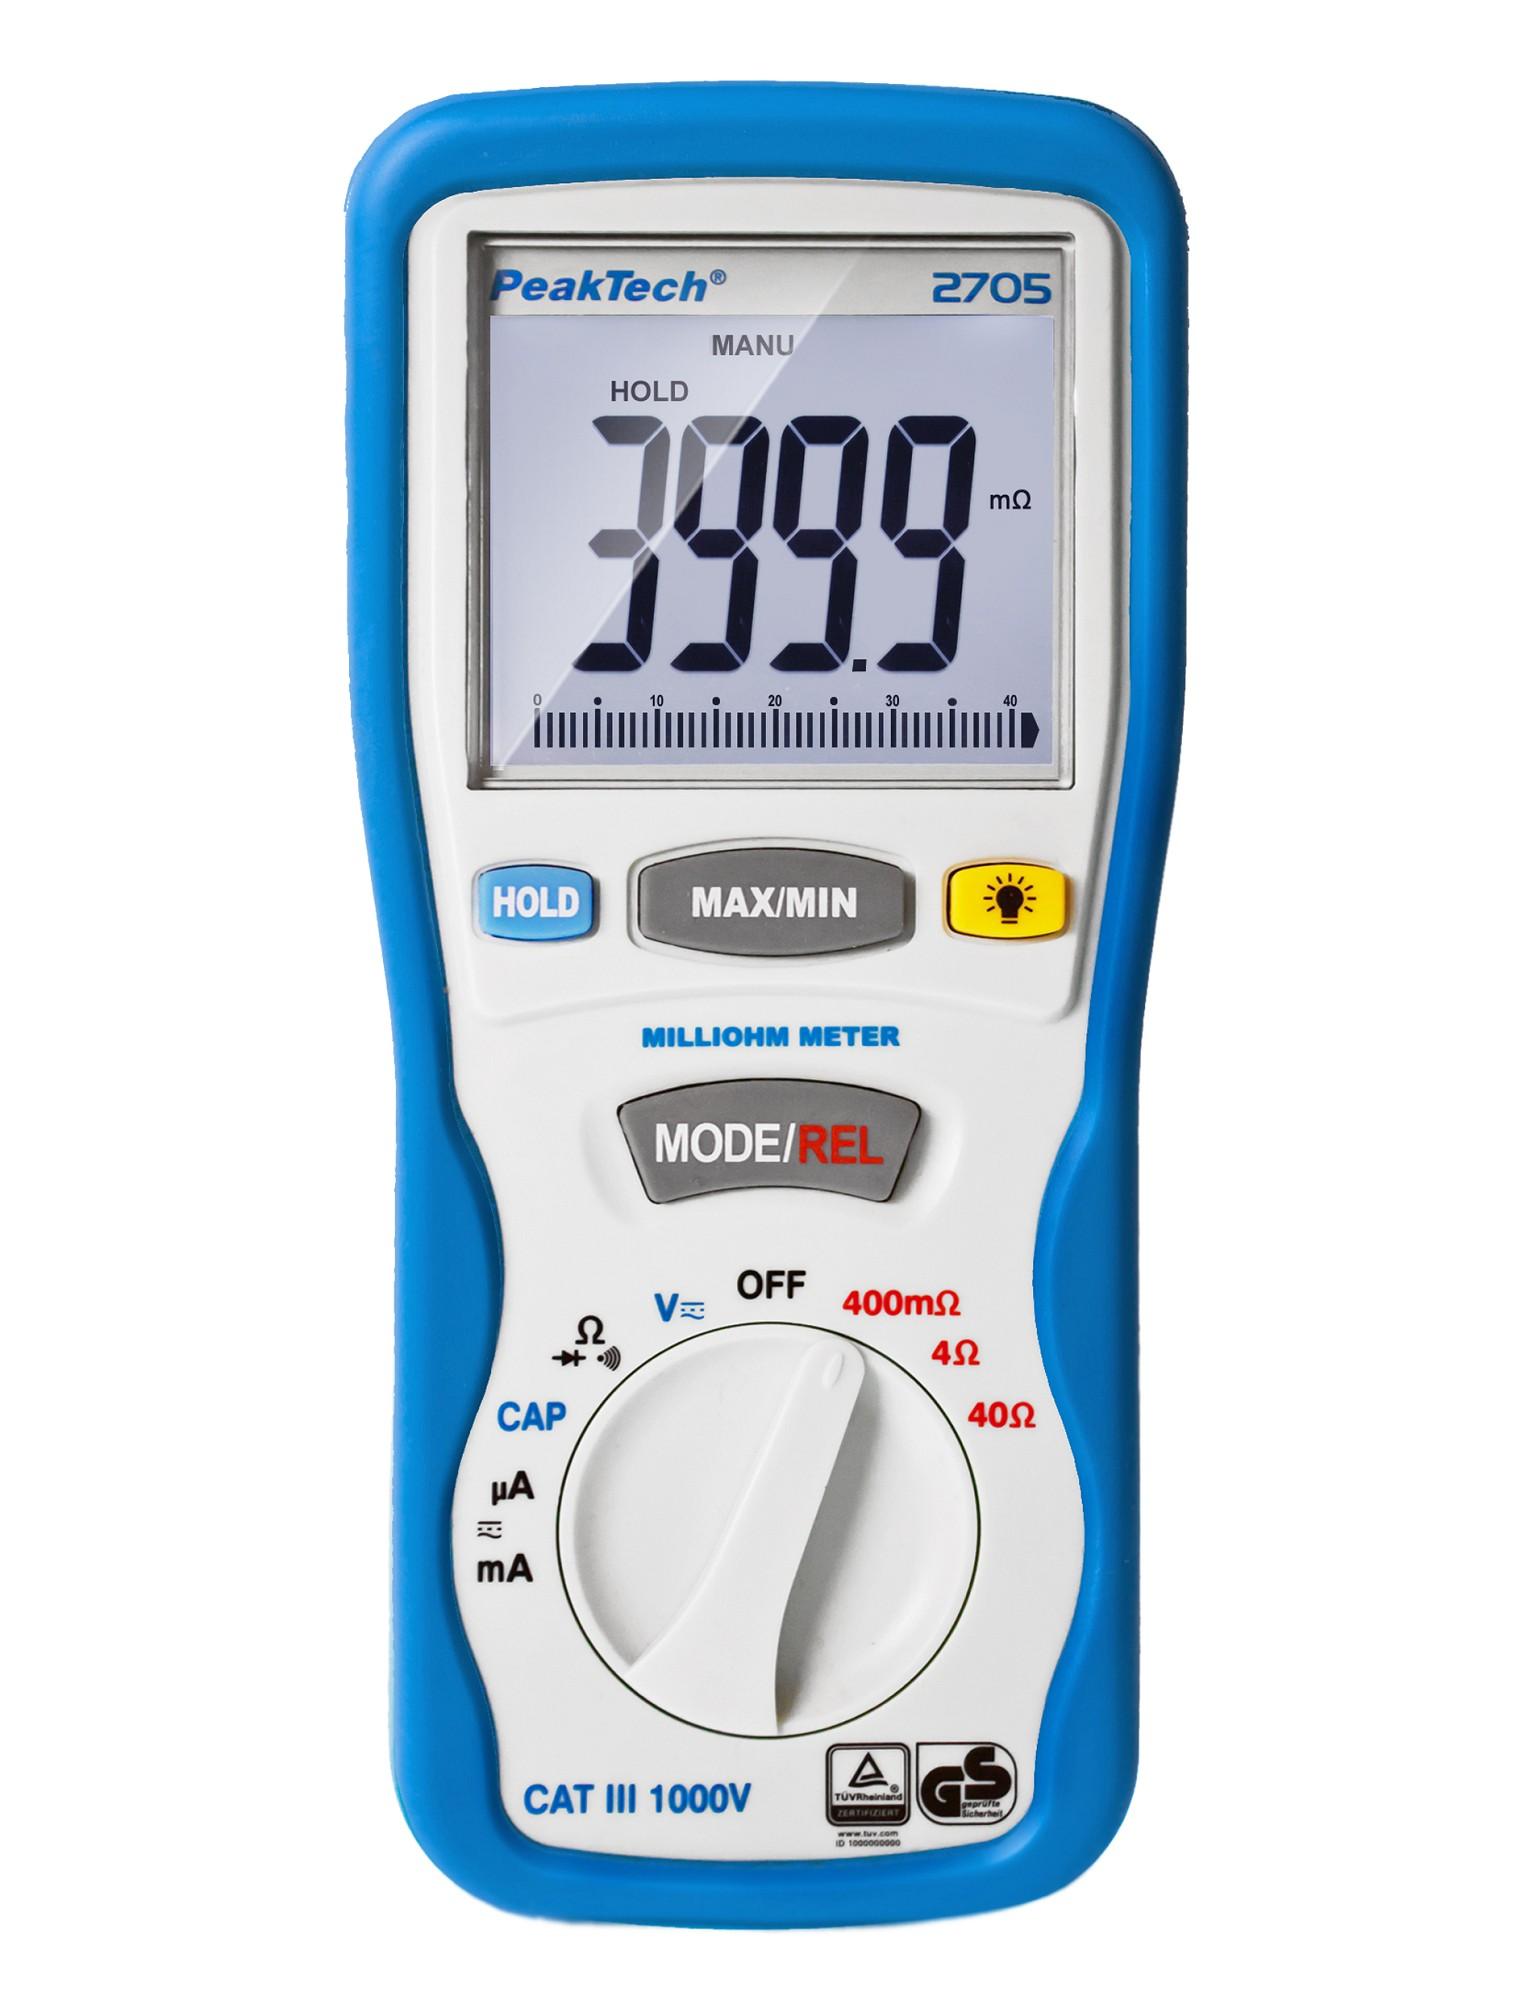 «PeakTech® P 2705» Digital milliohmmeter, 4,000 counts, 400 mΩ/4/40/Ω